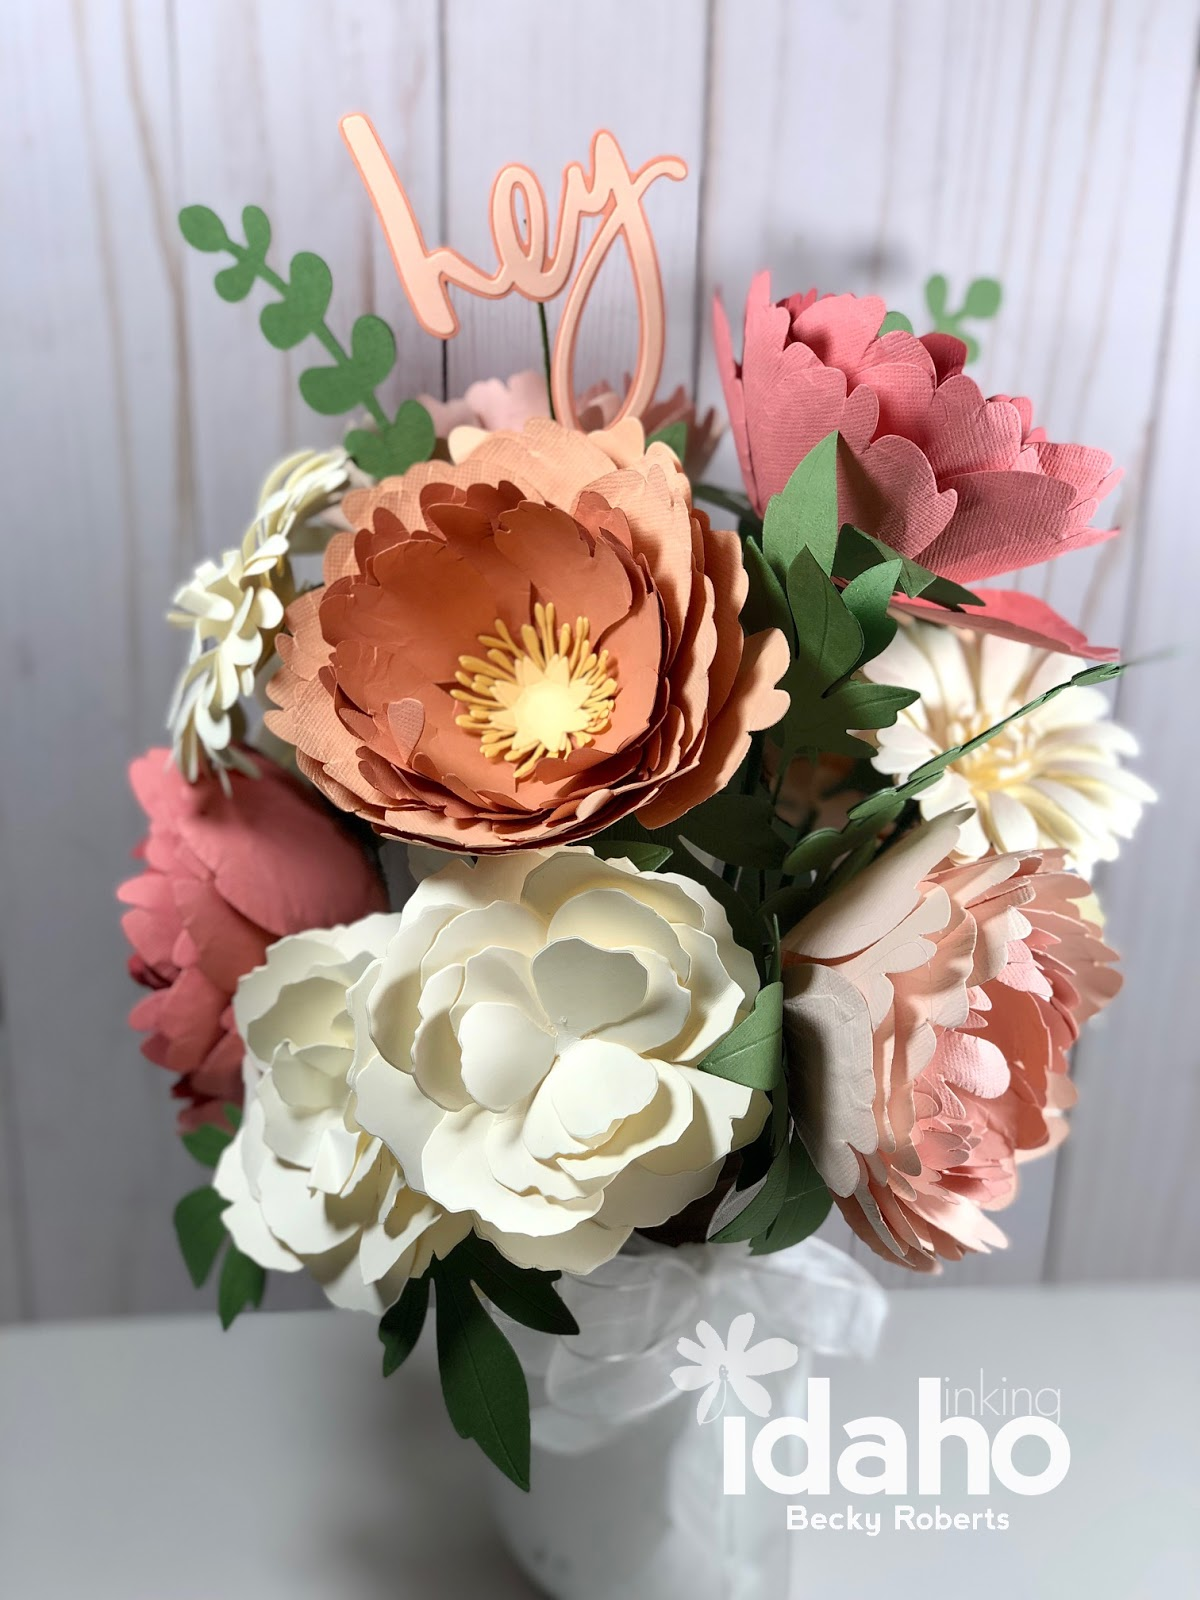 Inking Idaho My Newest Paper Flower Bouquet